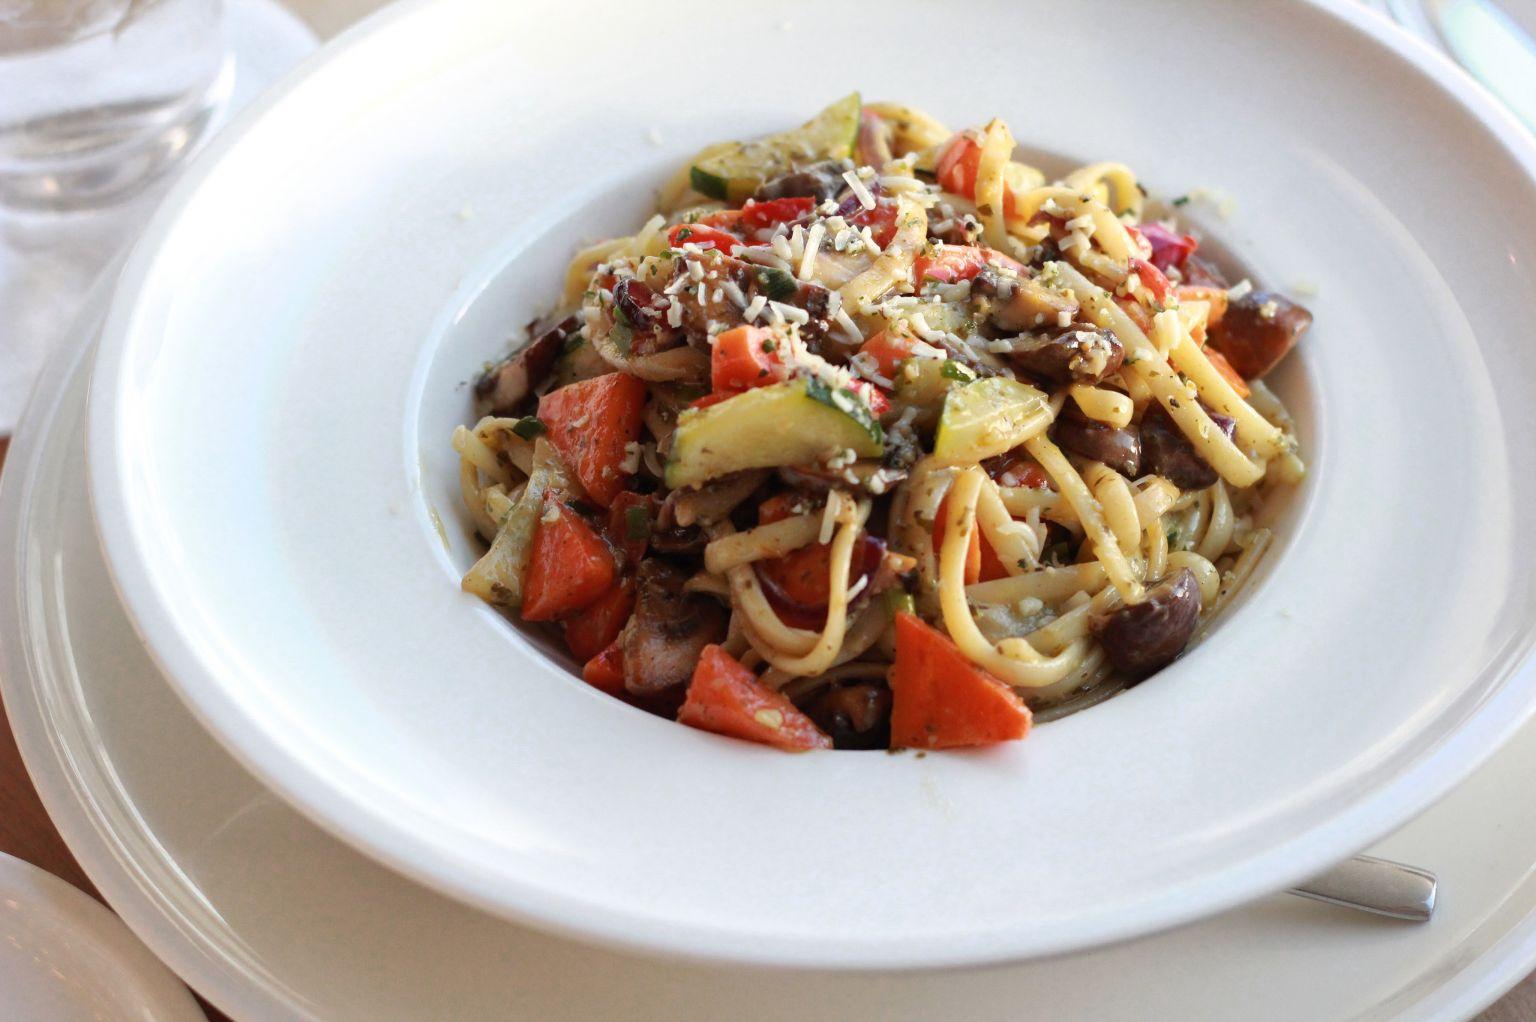 Drew ordered a veggie pasta. Delish!